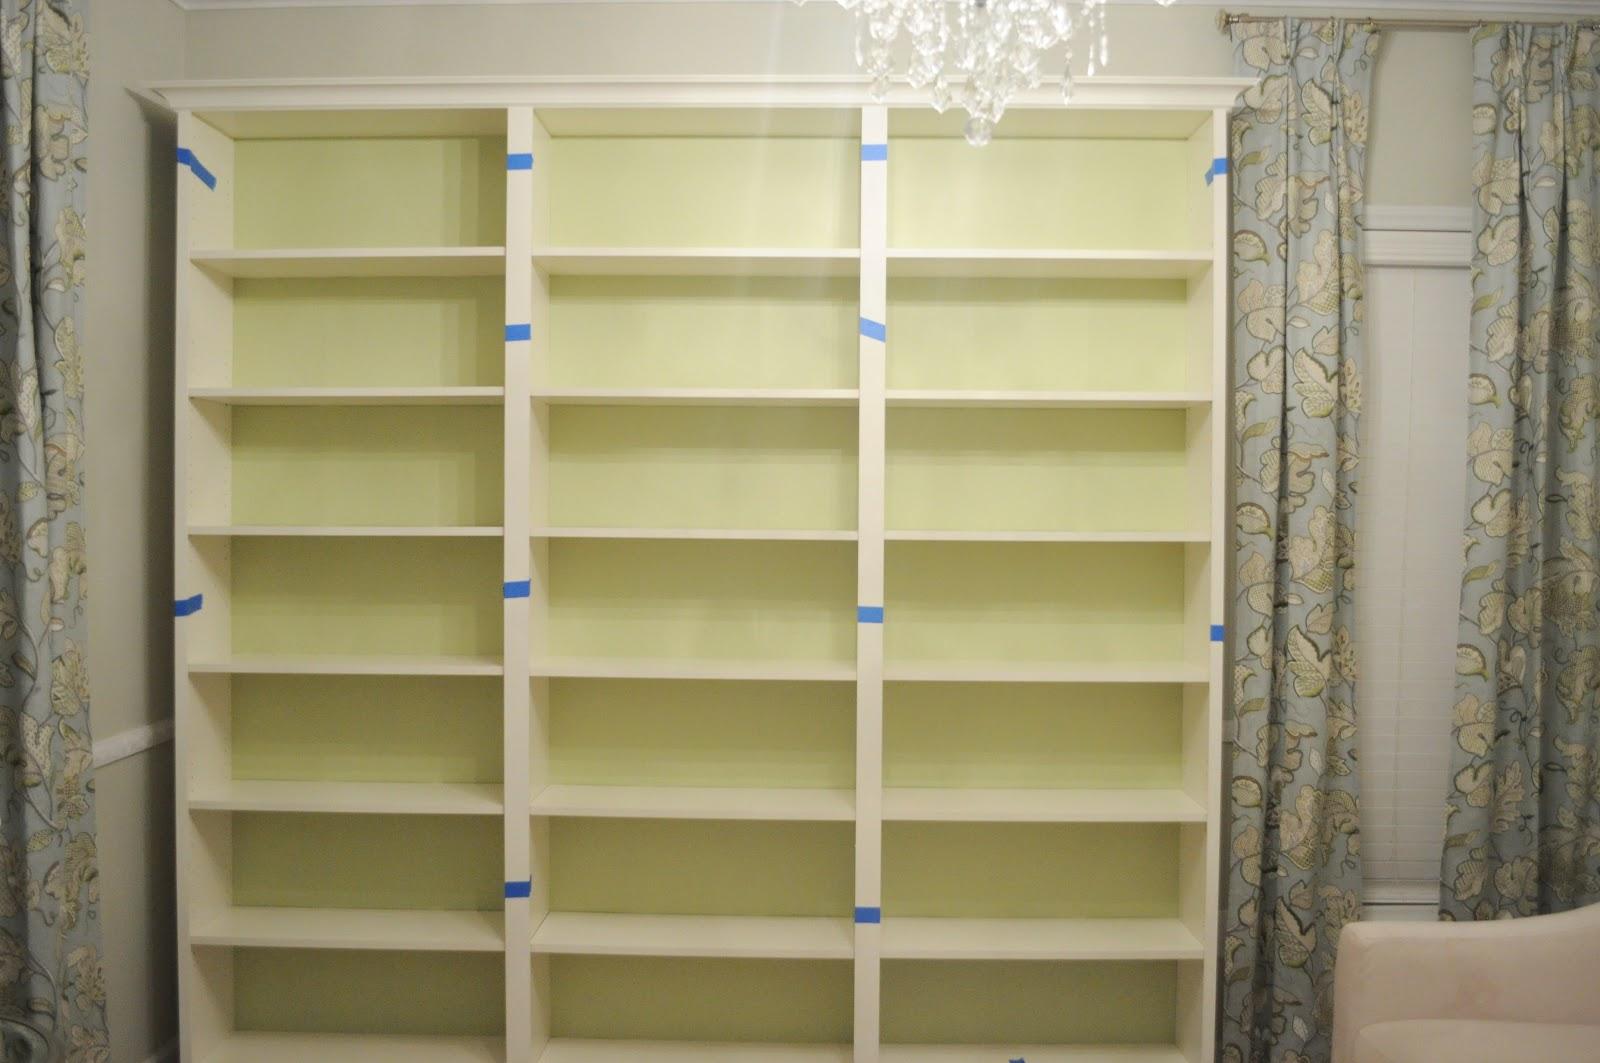 Adding The Trim Pieces Between Bookshelves